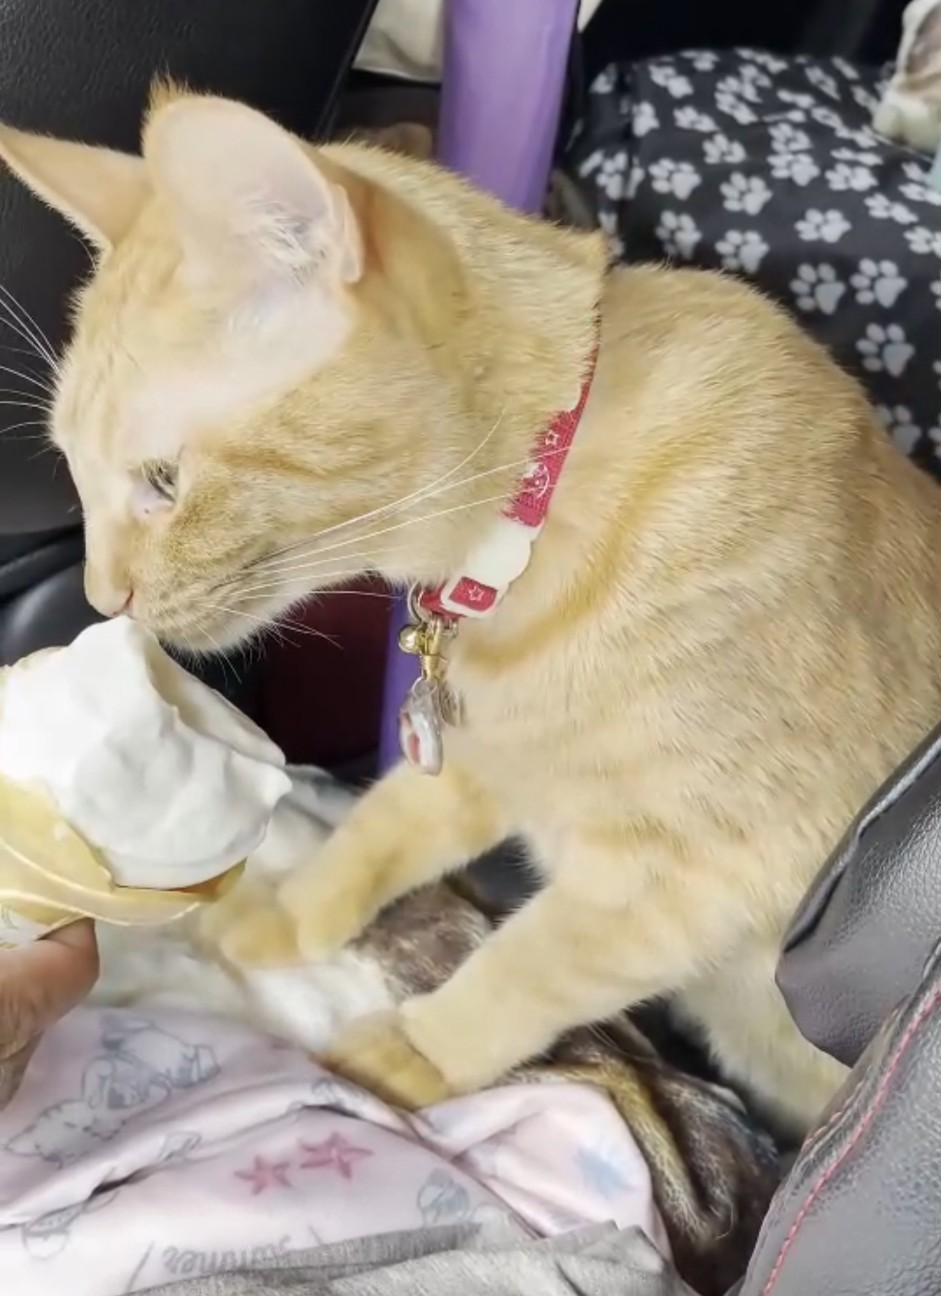 f:id:Three_Traveling_Cats:20210710225708j:image